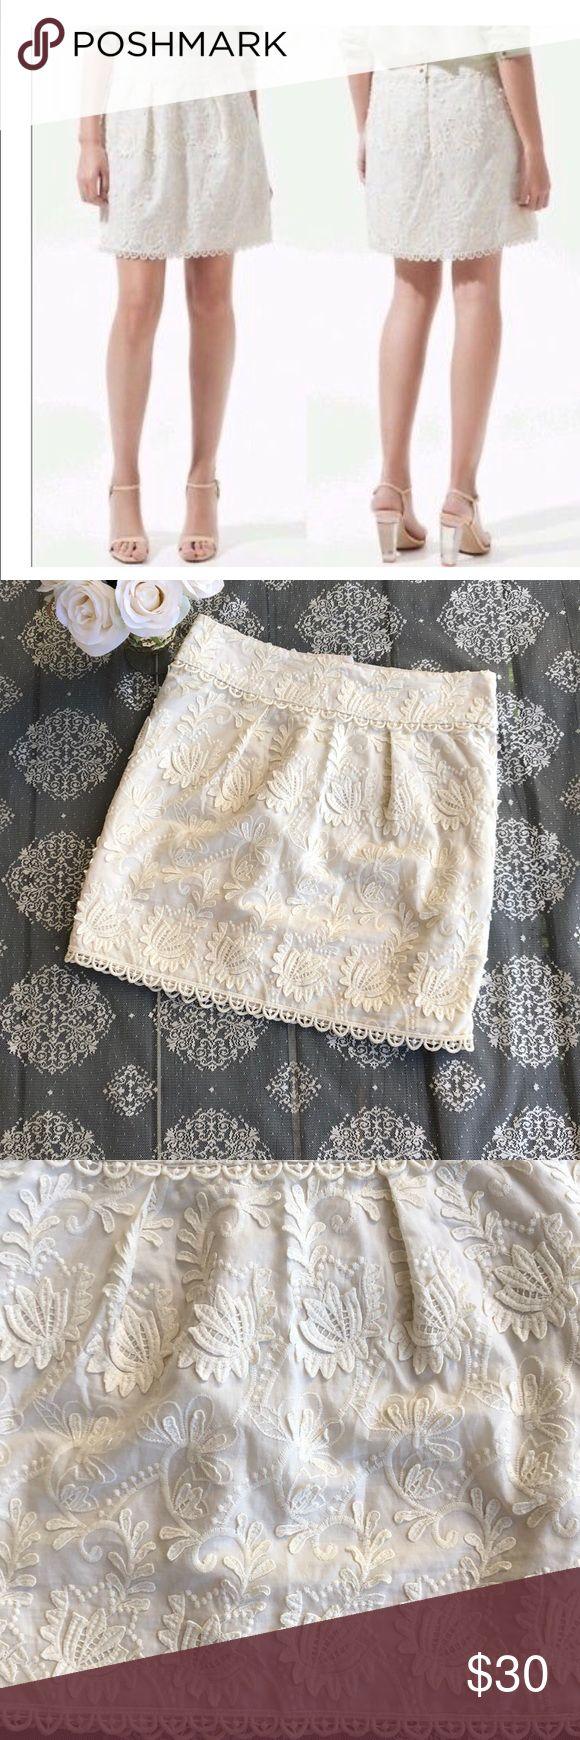 Like new Zara guipure lace skirt 100% cotton cream color size Medium. Excellent condition Zara Skirts Mini